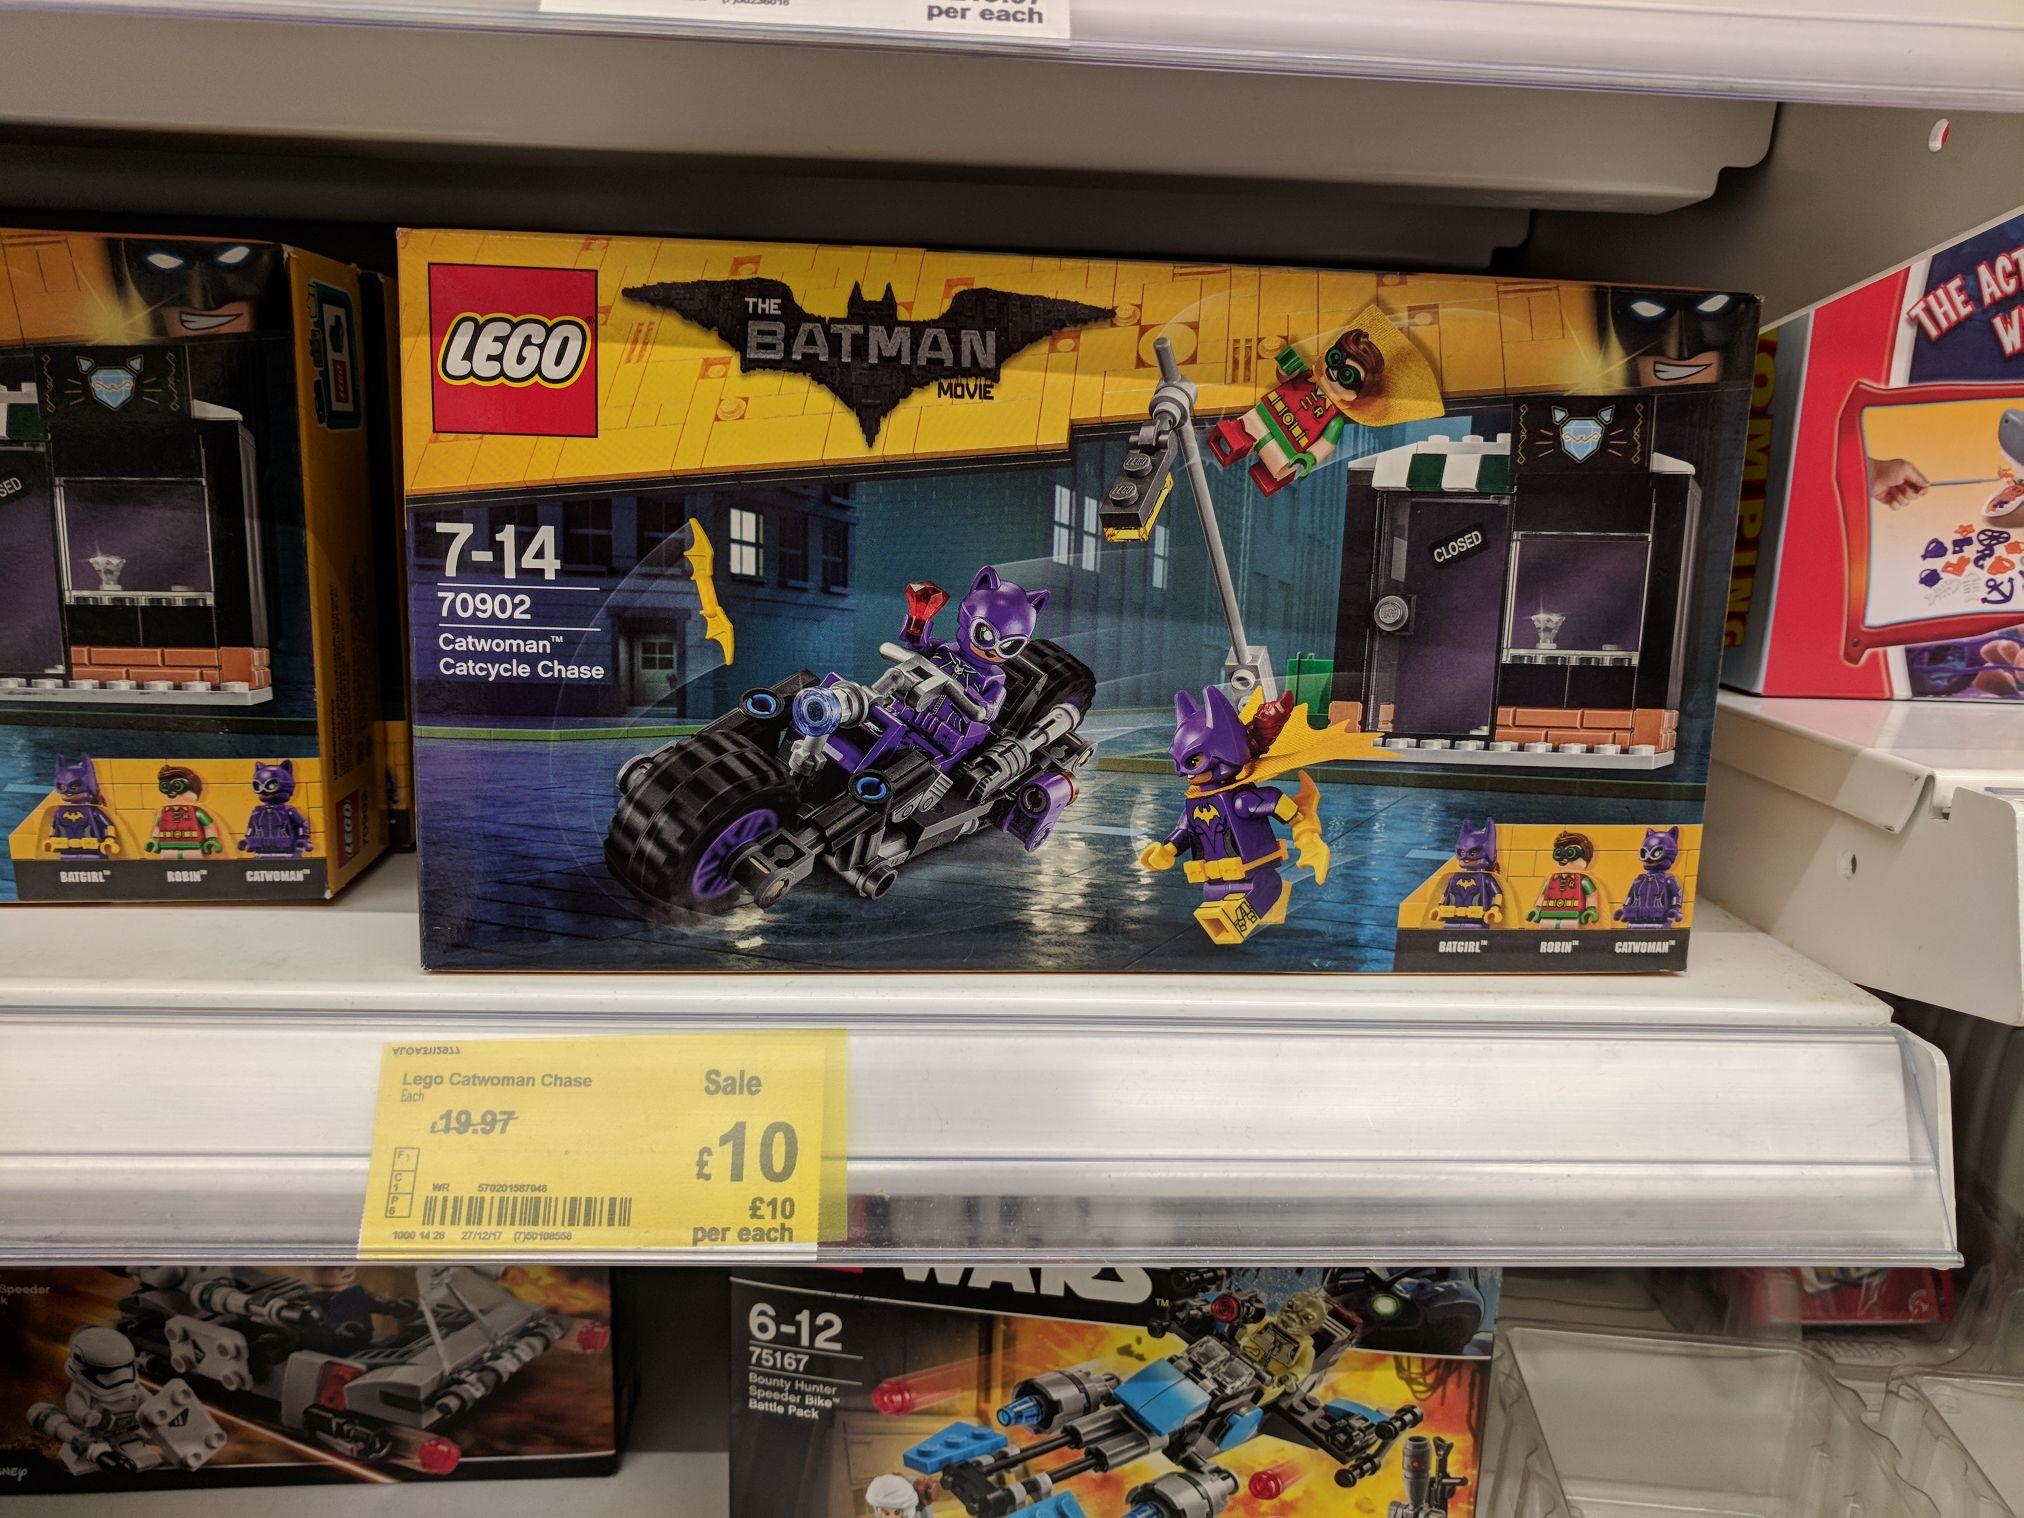 Lego Batman Movie Catwoman Catcycle Chase 70902 Set £10 @ Asda